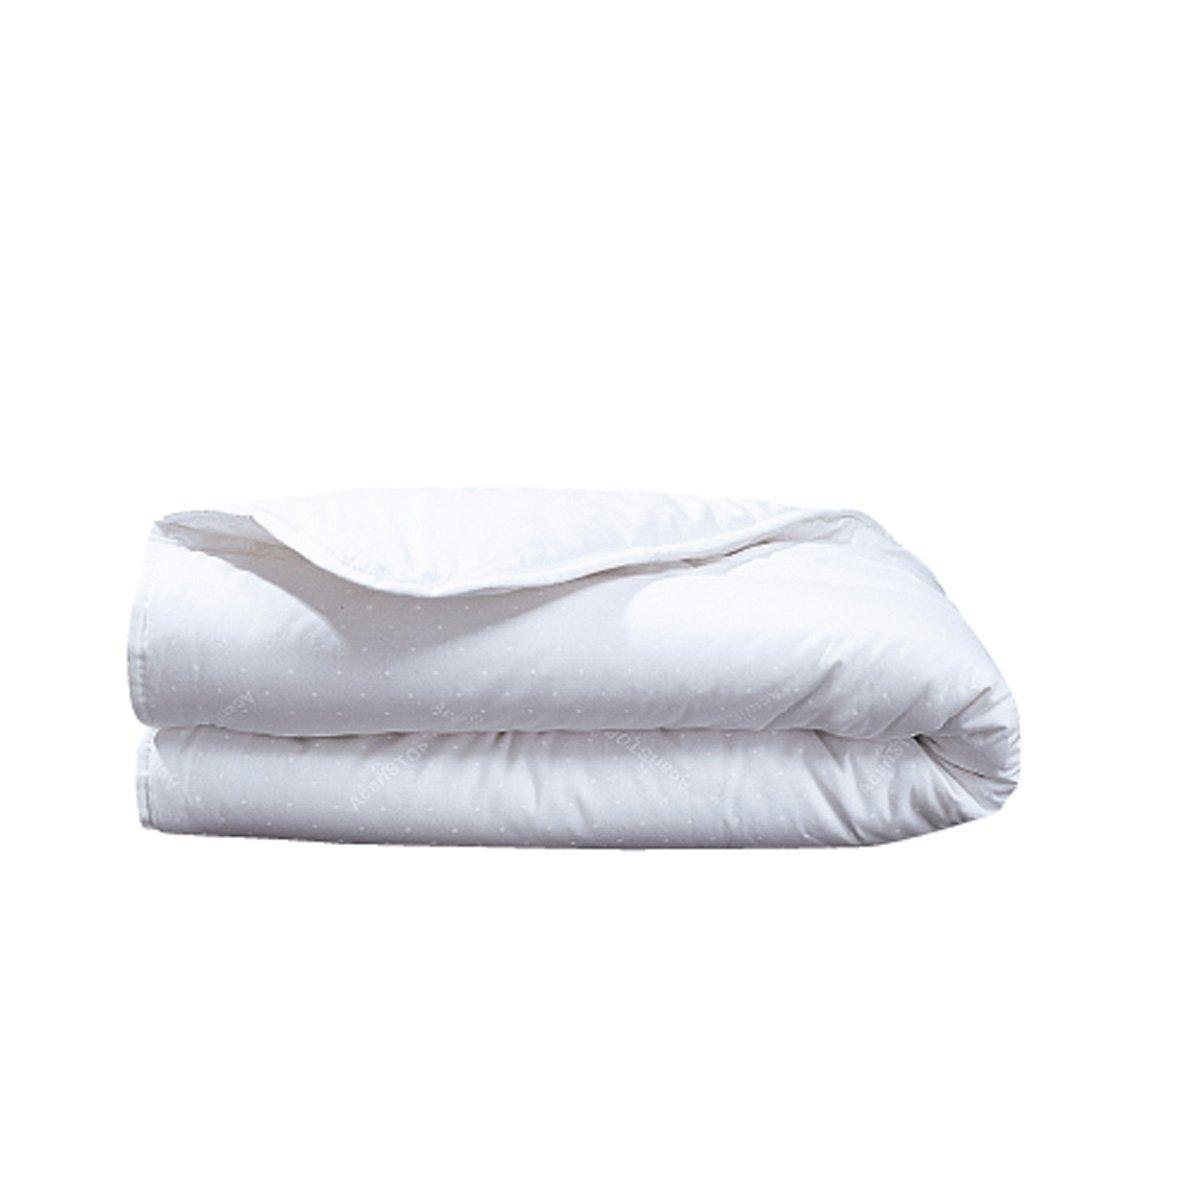 Одеяло детское с обработкой от La Redoute